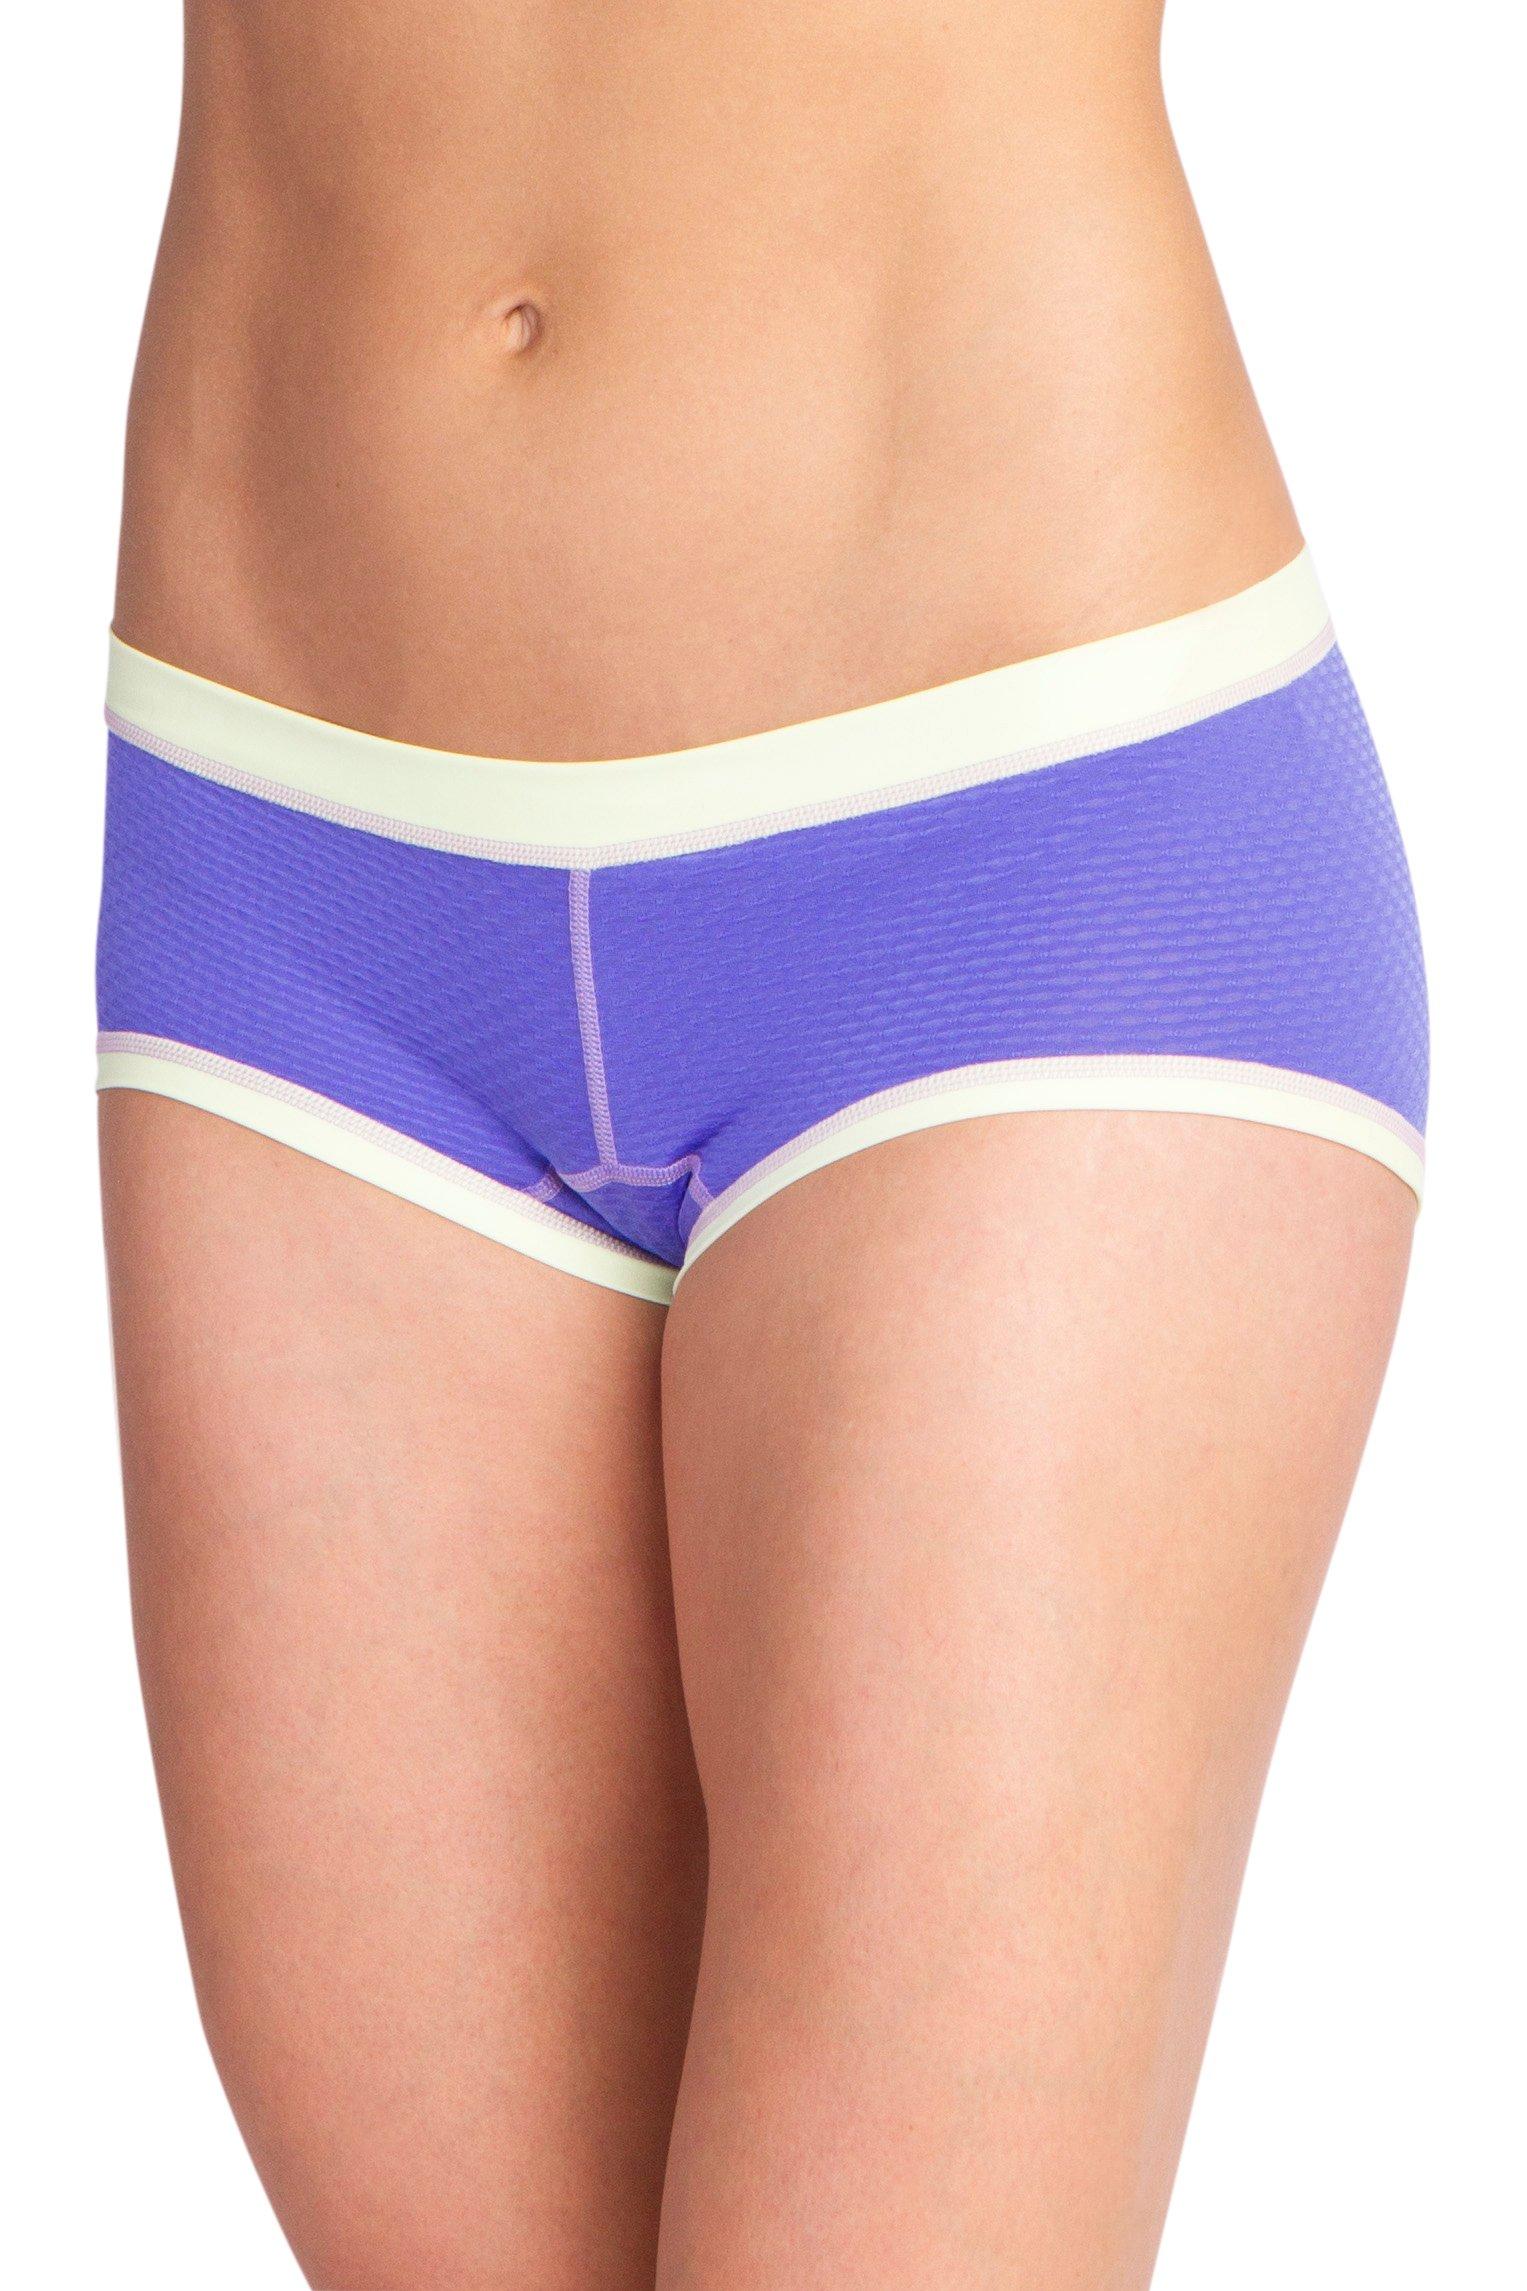 ExOfficio Women's Give-N-Go Sport Mesh Hipkini, Blue Iris, Small